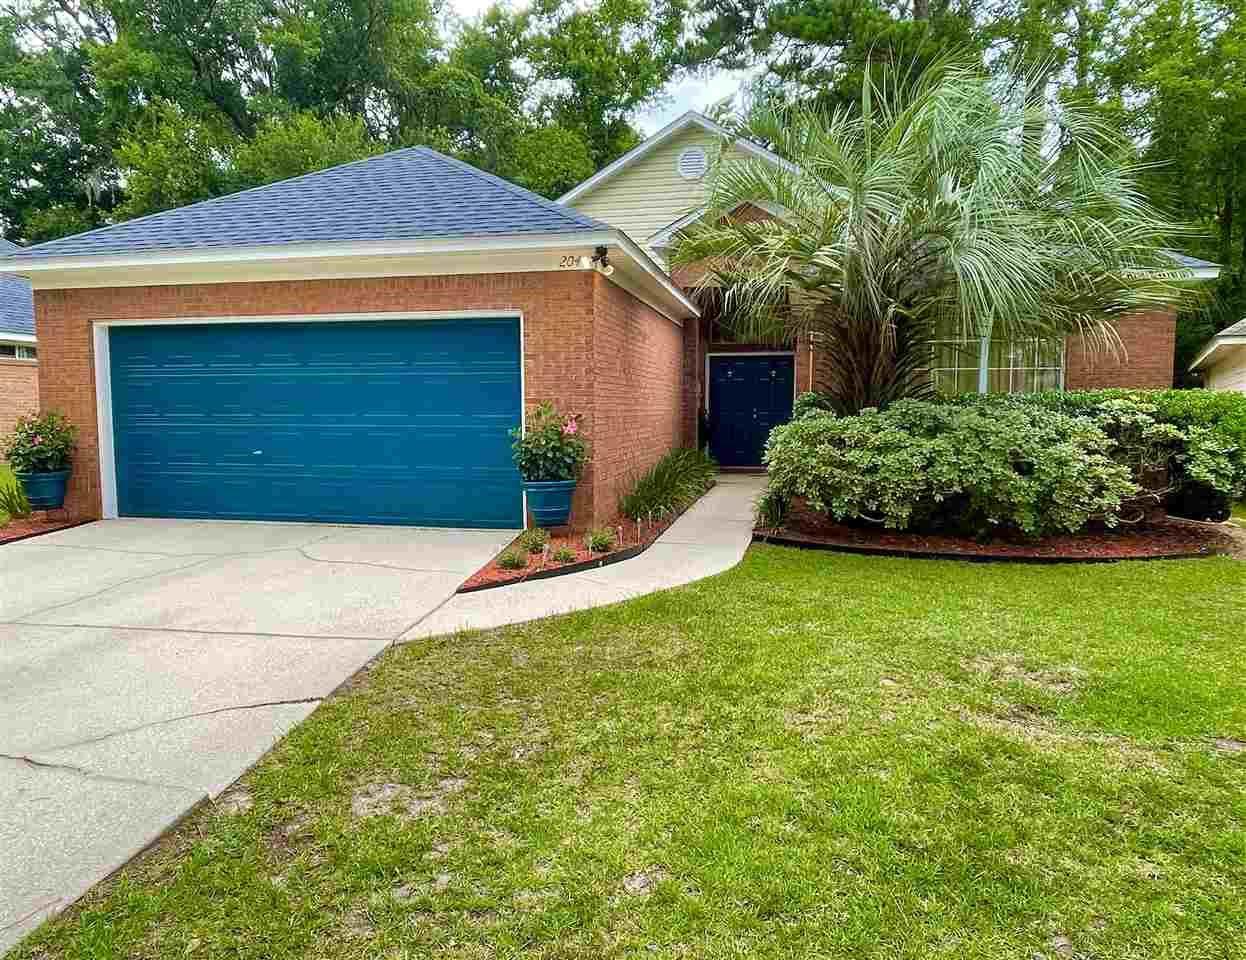 Photo of 204 Baxter Court, TALLAHASSEE, FL 32312 (MLS # 333546)